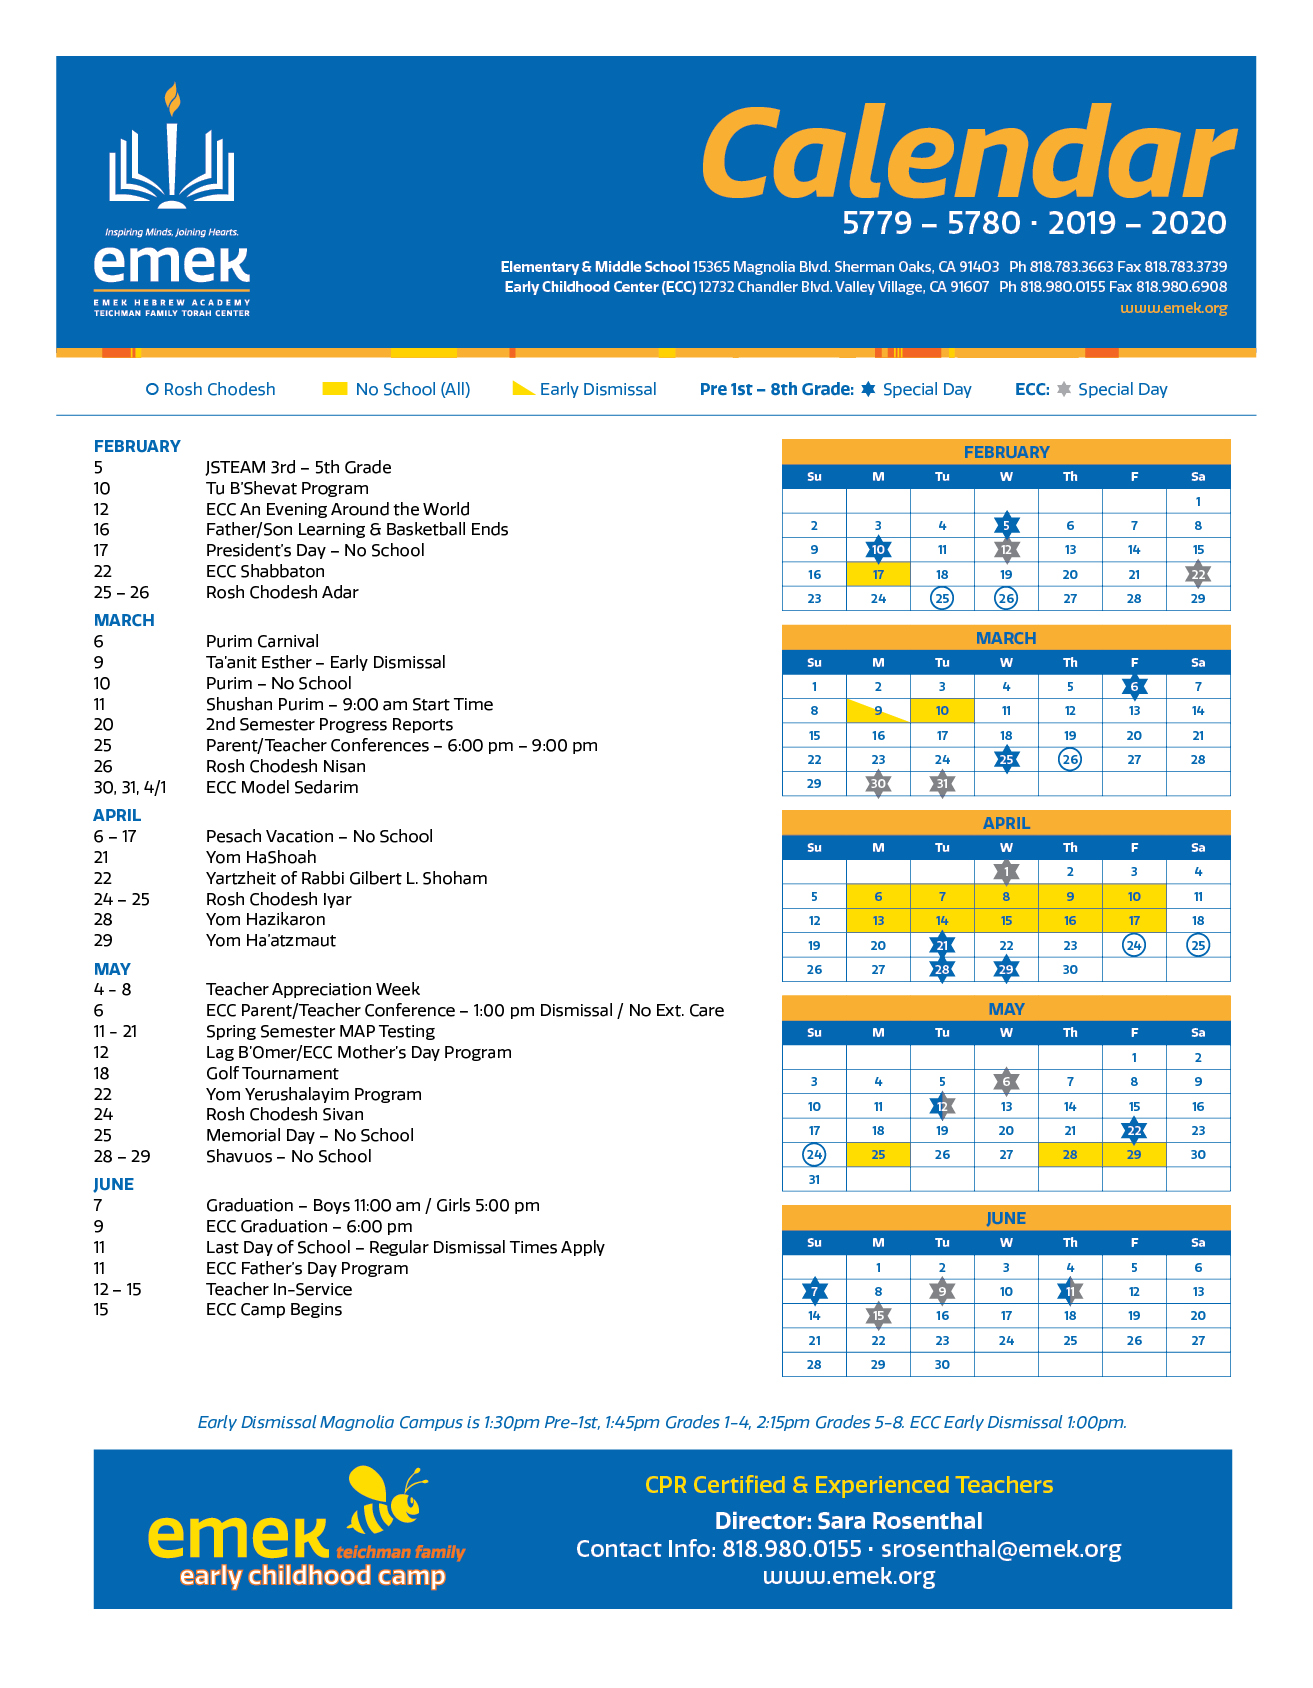 EmekCalendar_2019-2020_FNL_Back.jpg